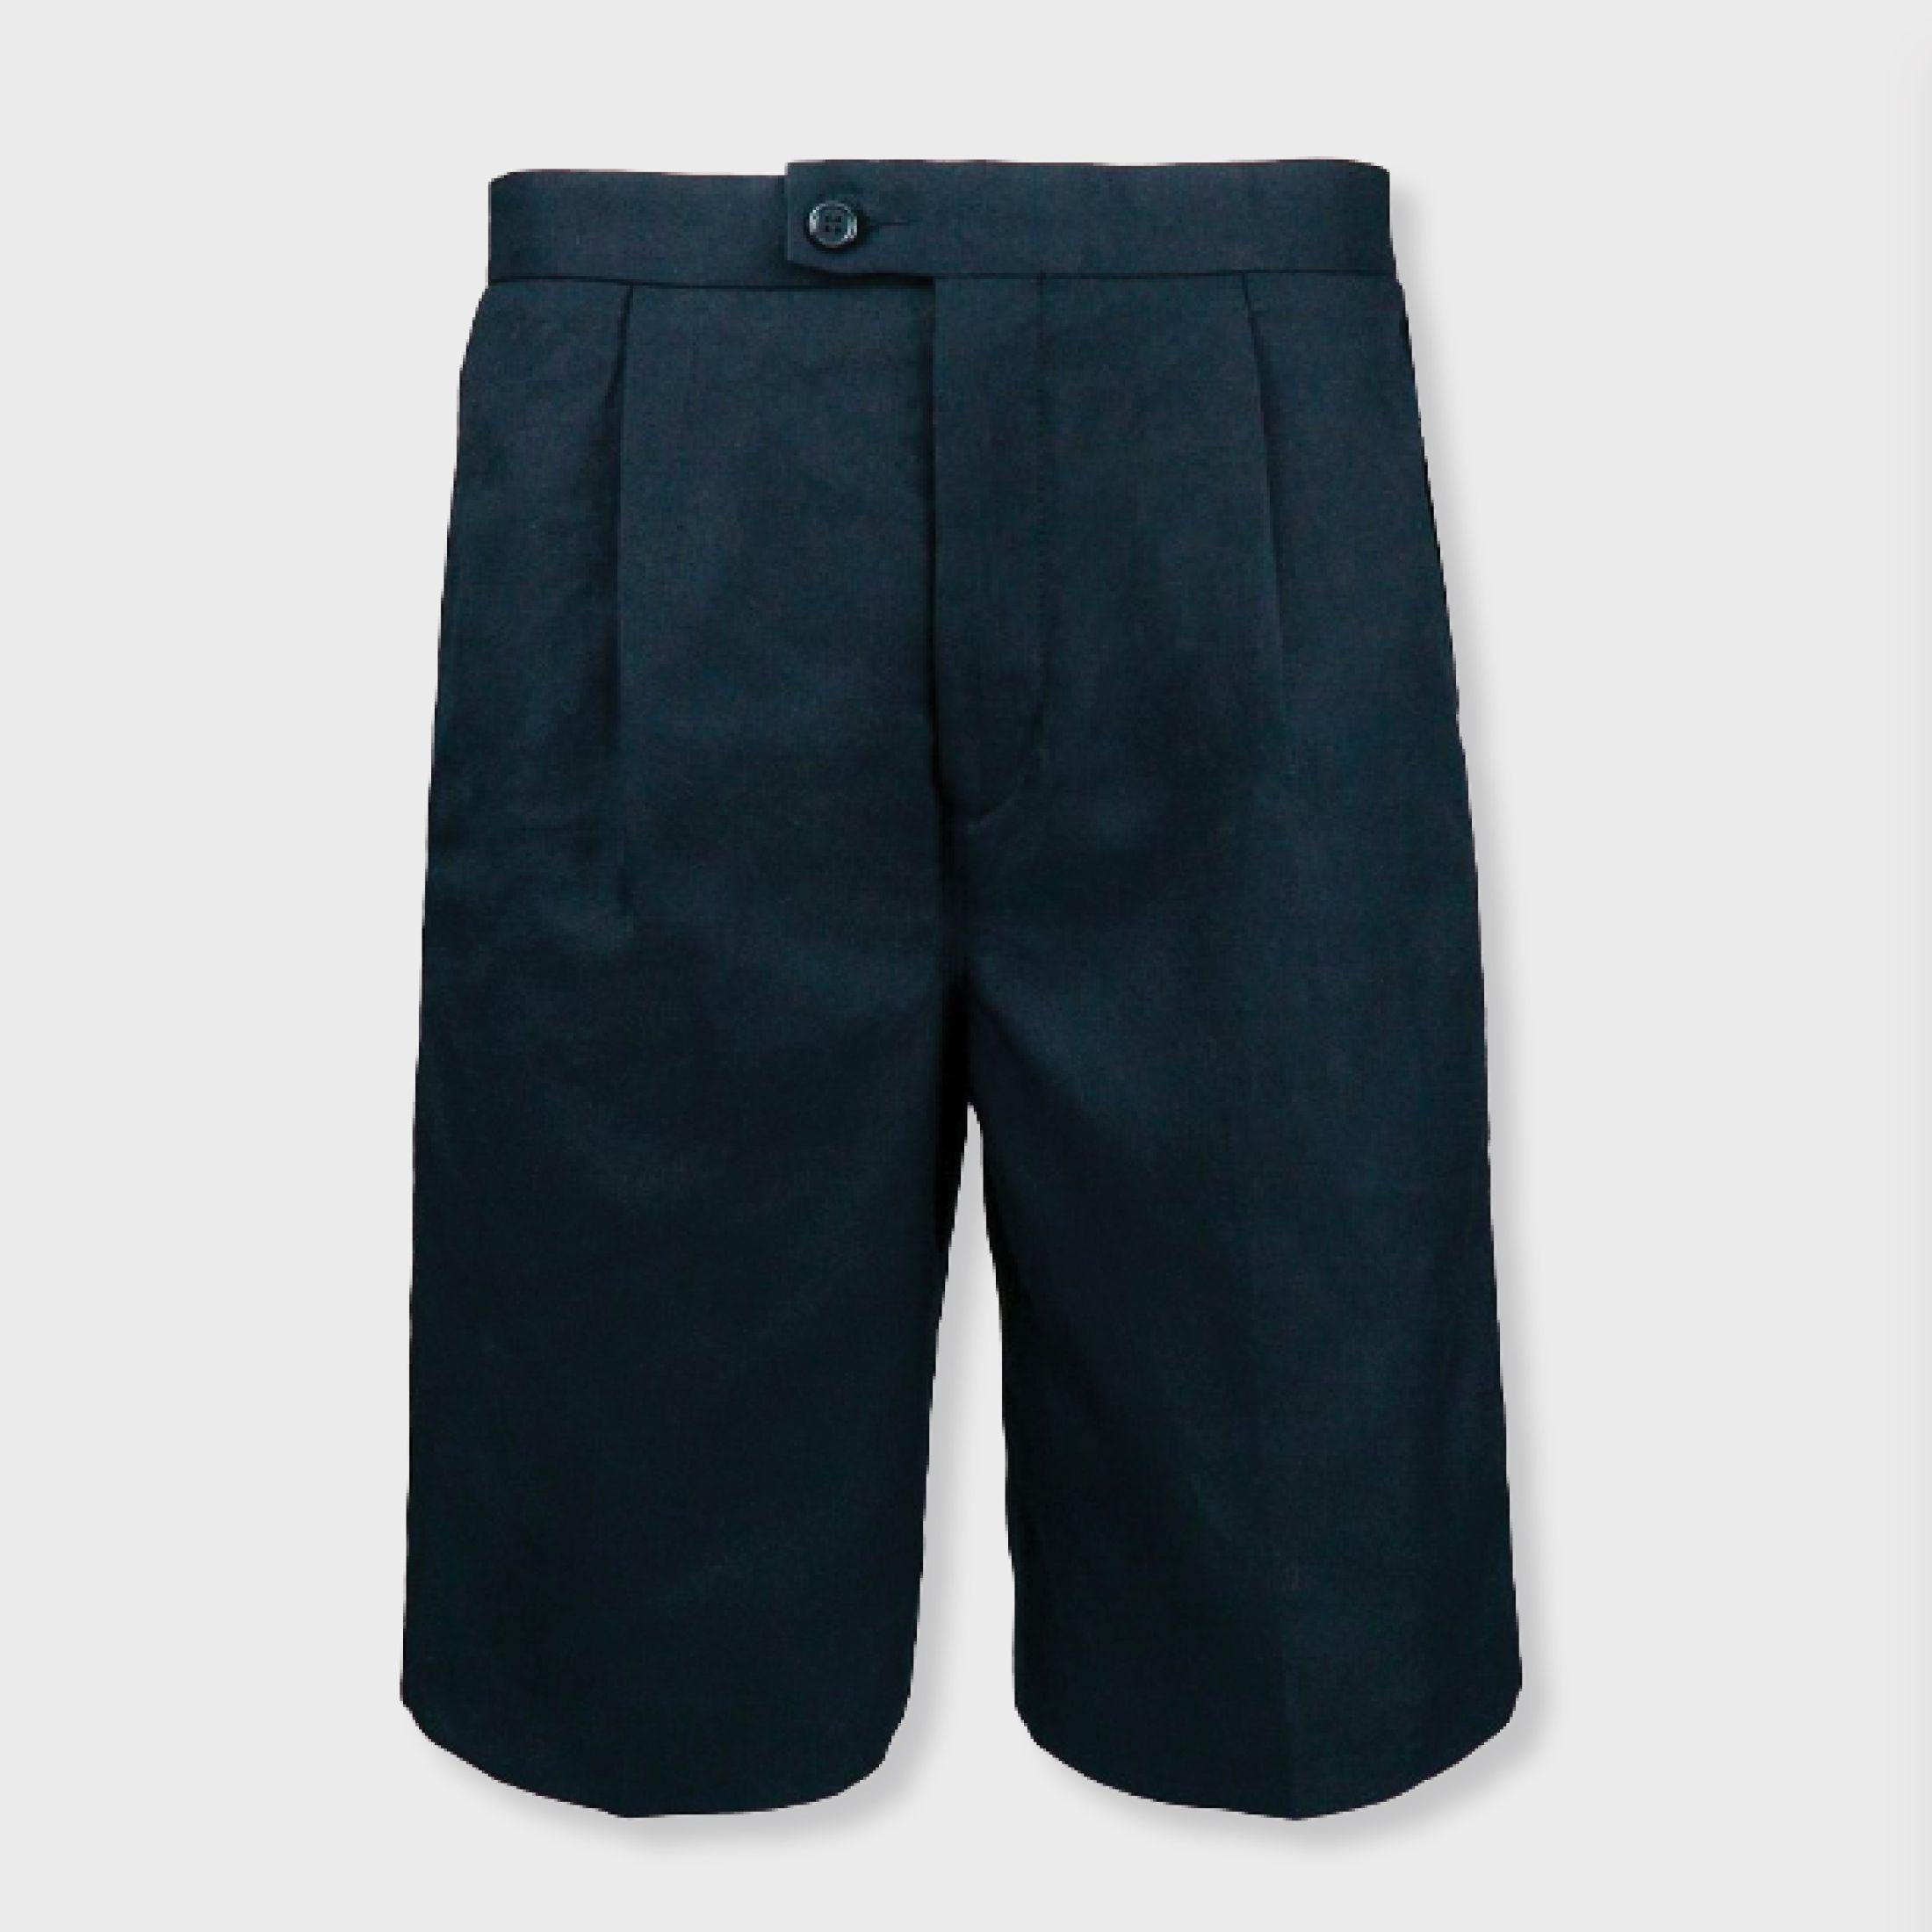 Charcoal School Shorts